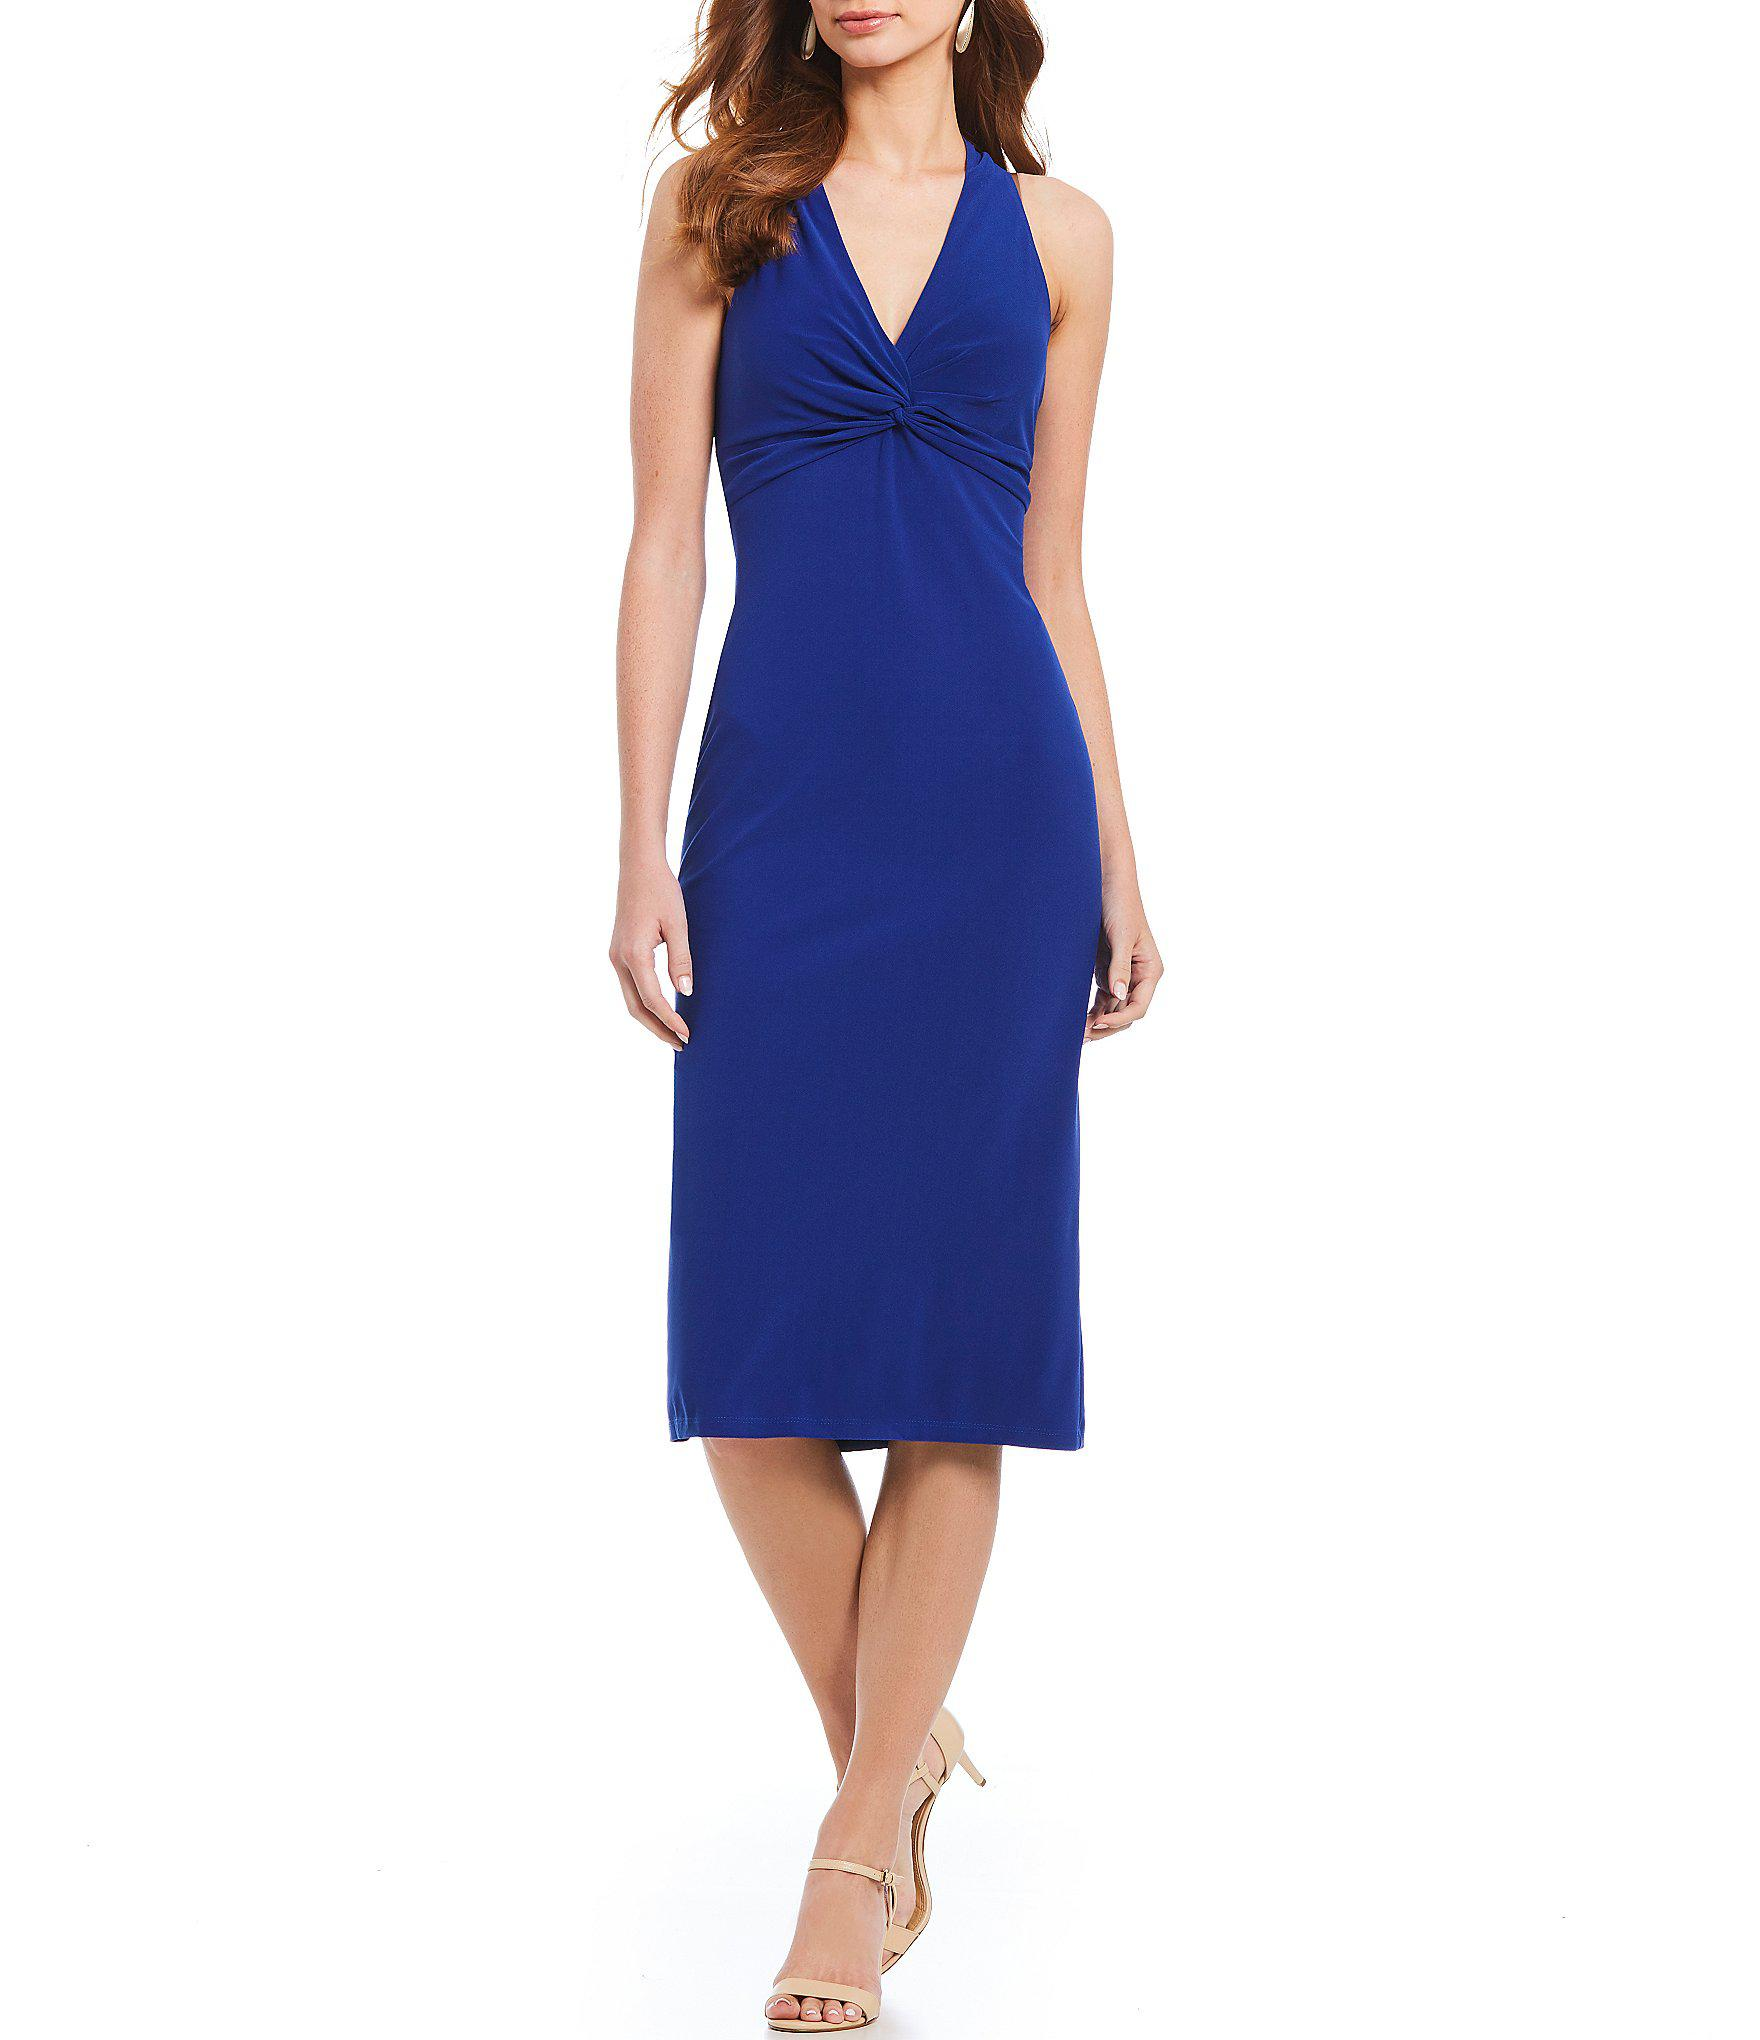 Lyst - Maggy London V Neck Knot Front Crepe Midi Dress in Blue 3ec2b855d